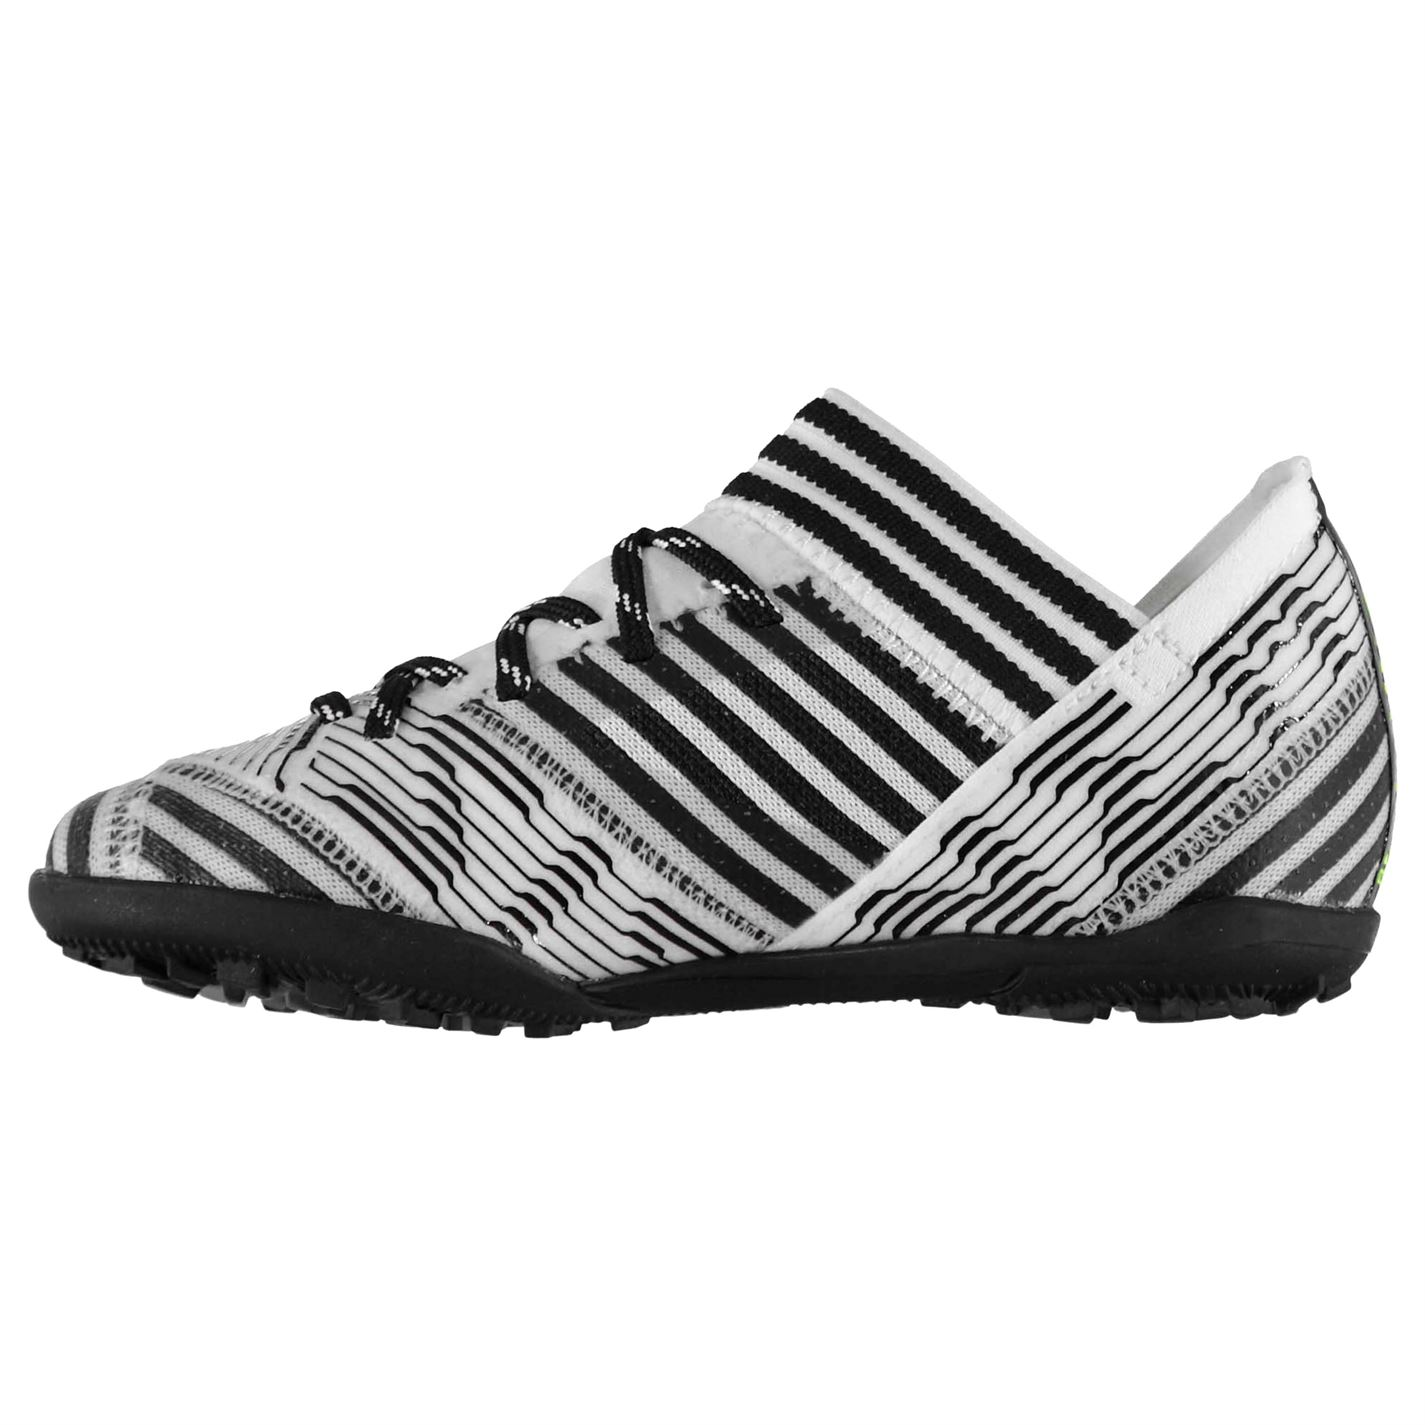 Adidas Kids Nemeziz 17.3 TF Football Football Football Stiefel Boys schuhe Lace Up Textile Sports 8288a3